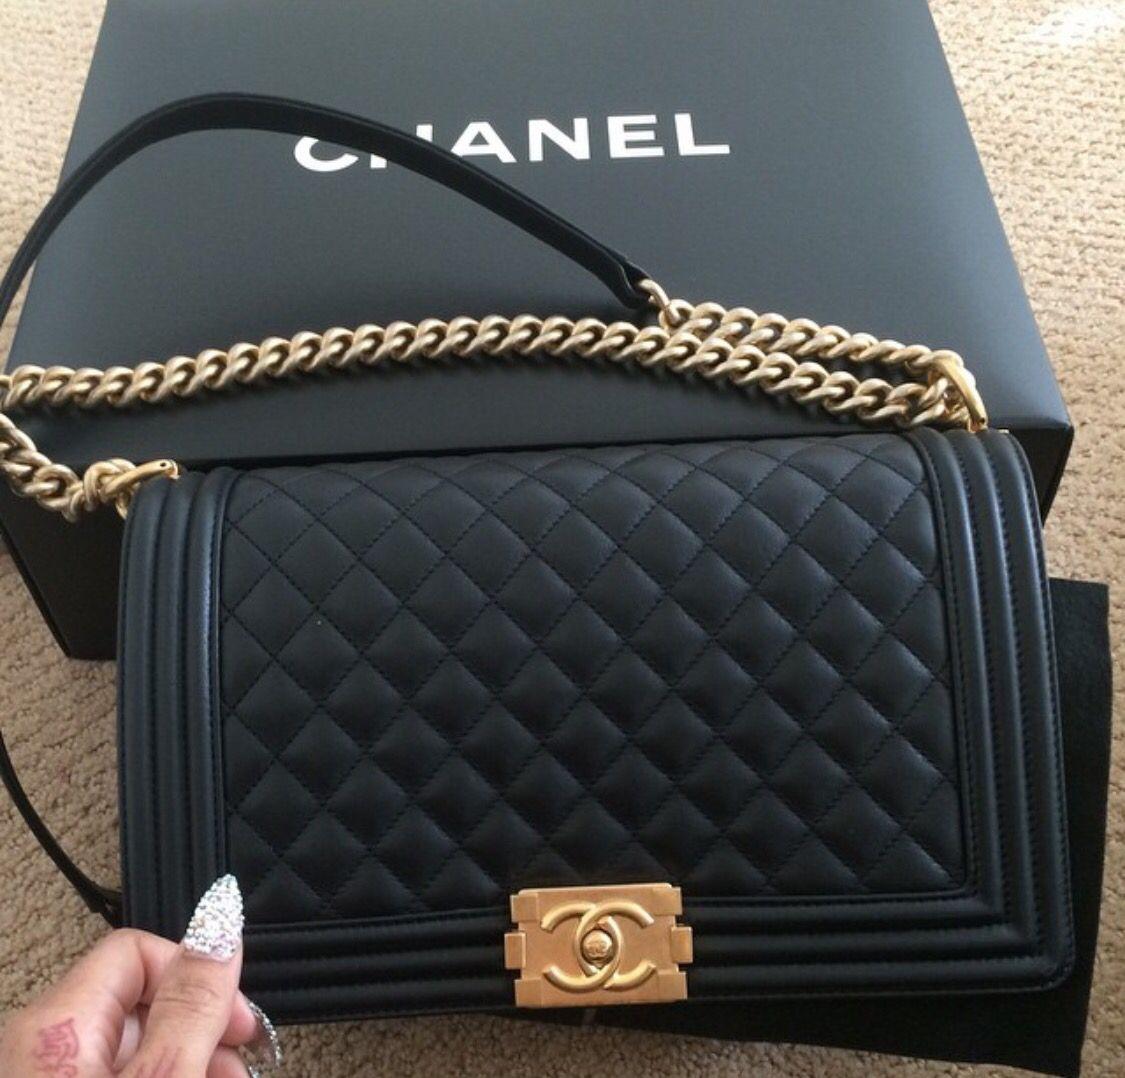 030ba37e88c7 Chanel purse❤   (purses, etc.)   Pinterest   Bags, Chanel and ...